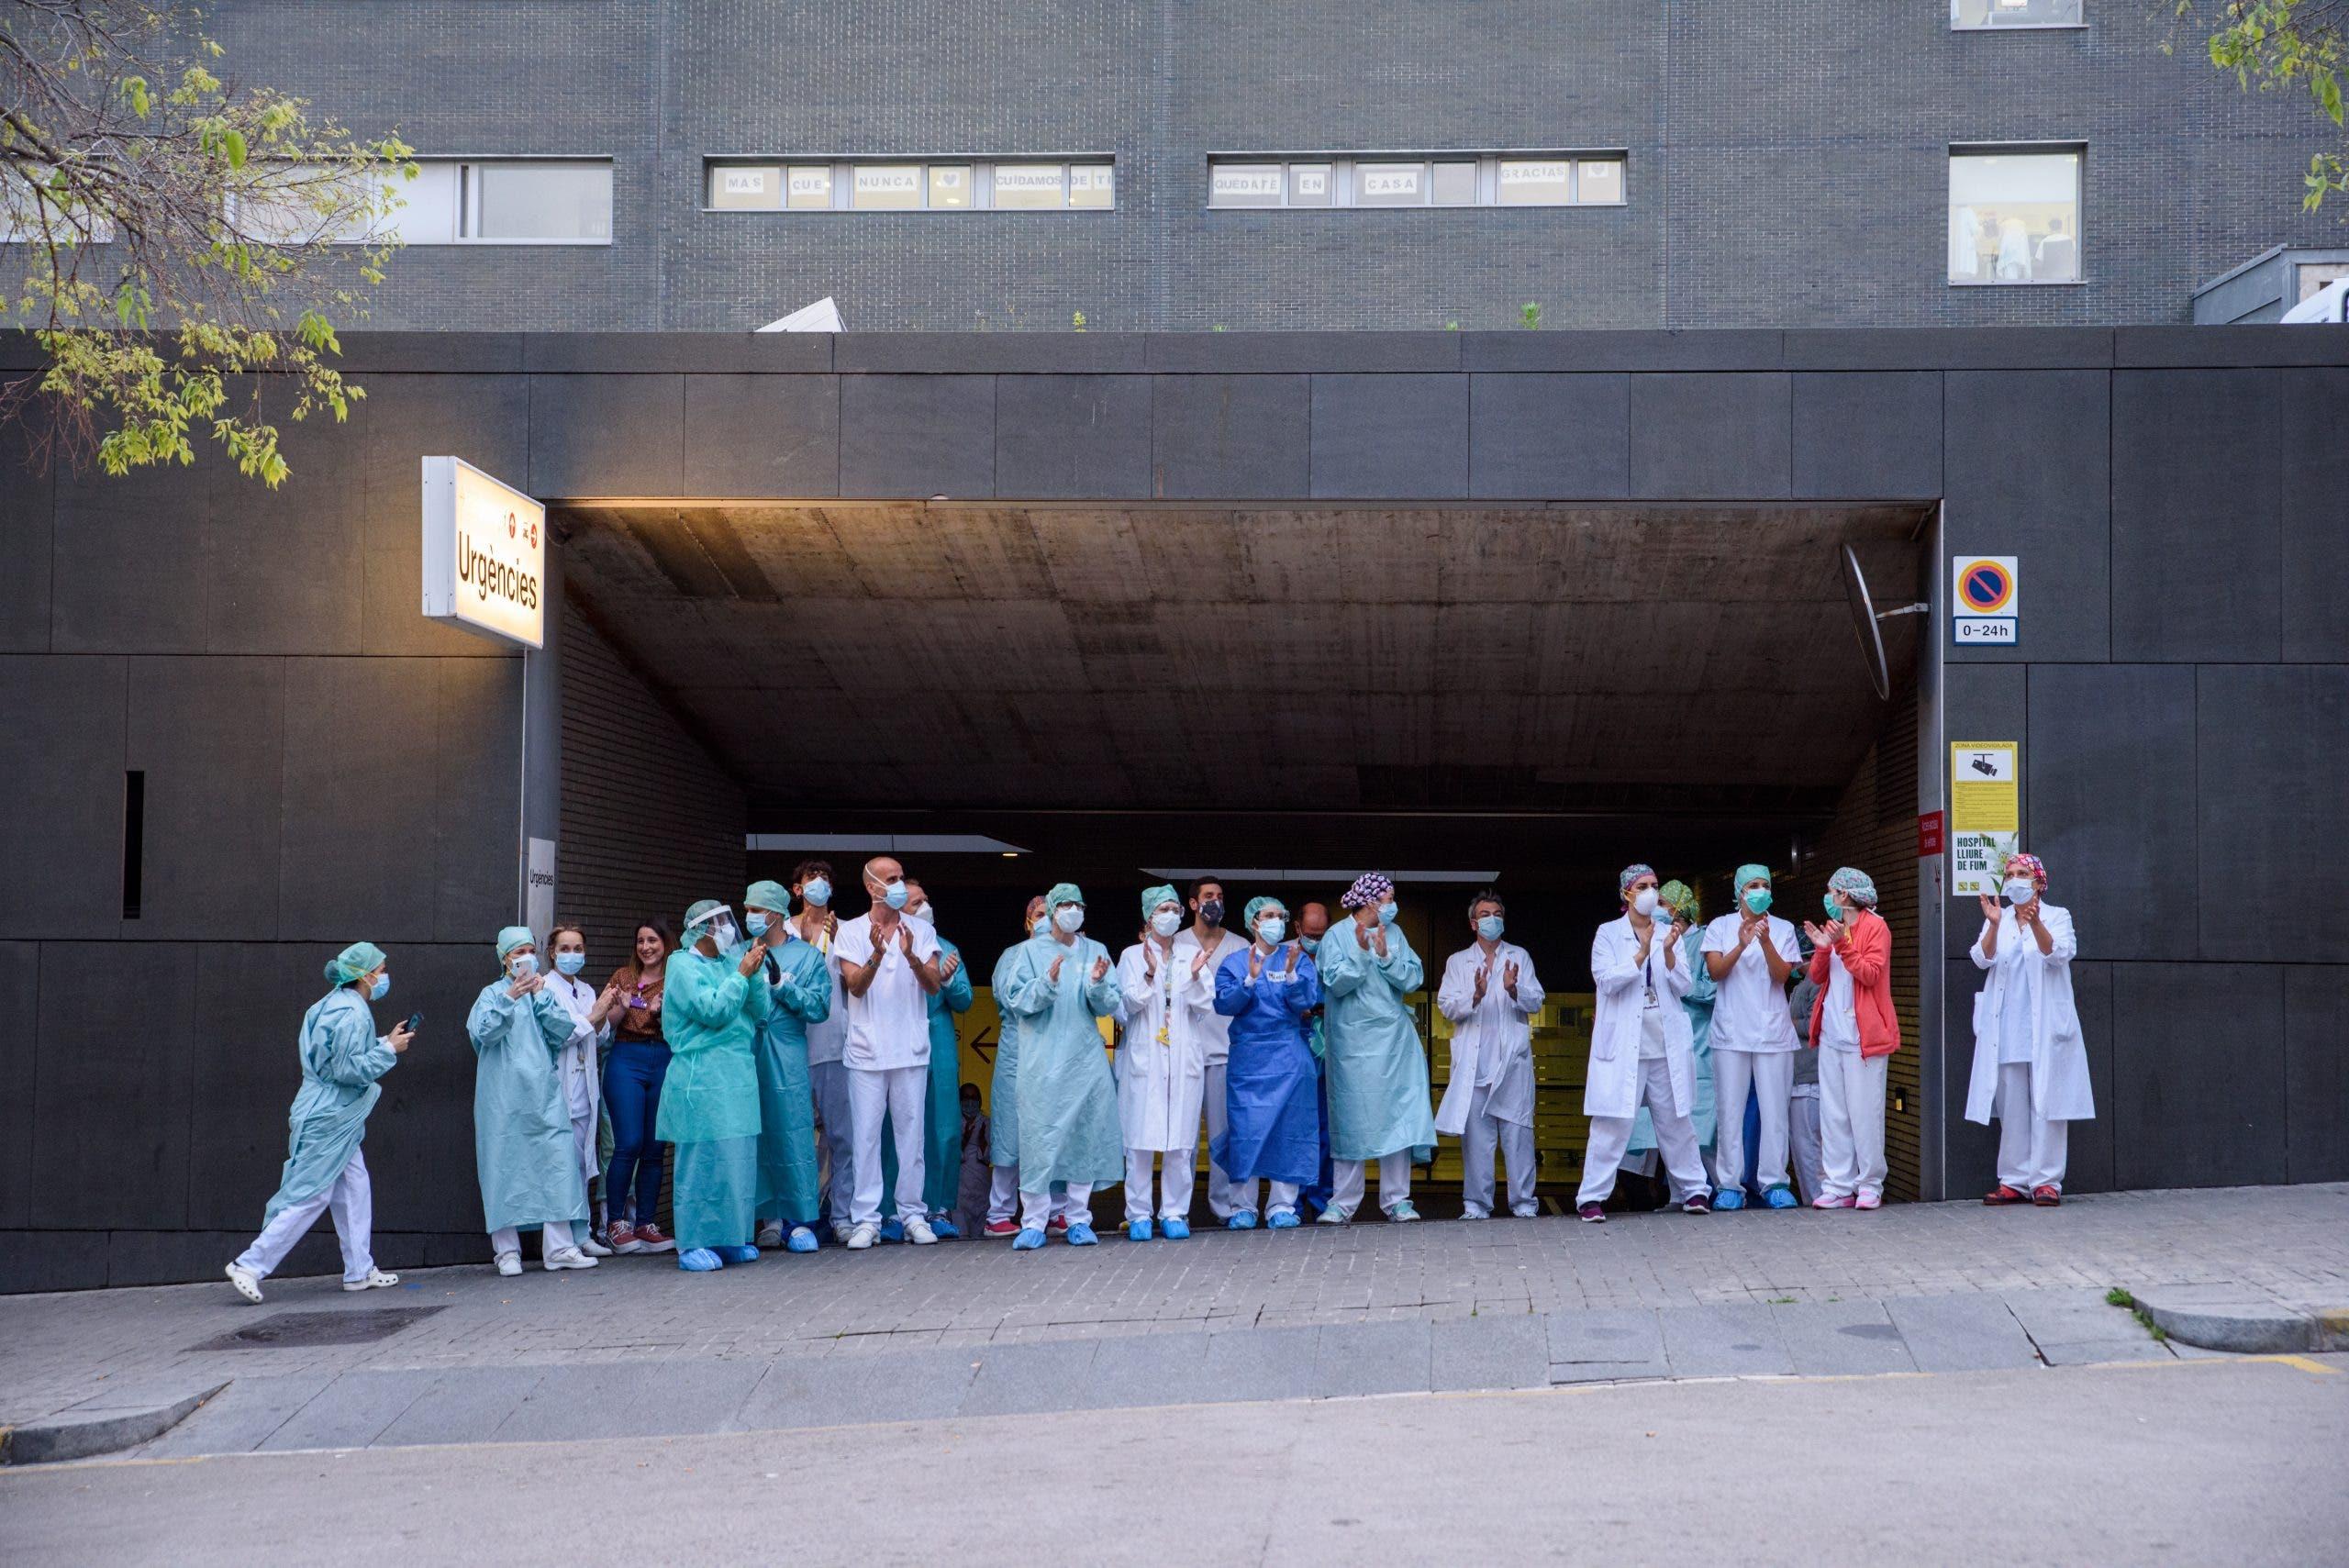 Medical Staff Applauding At Hospital Sant Pau 5